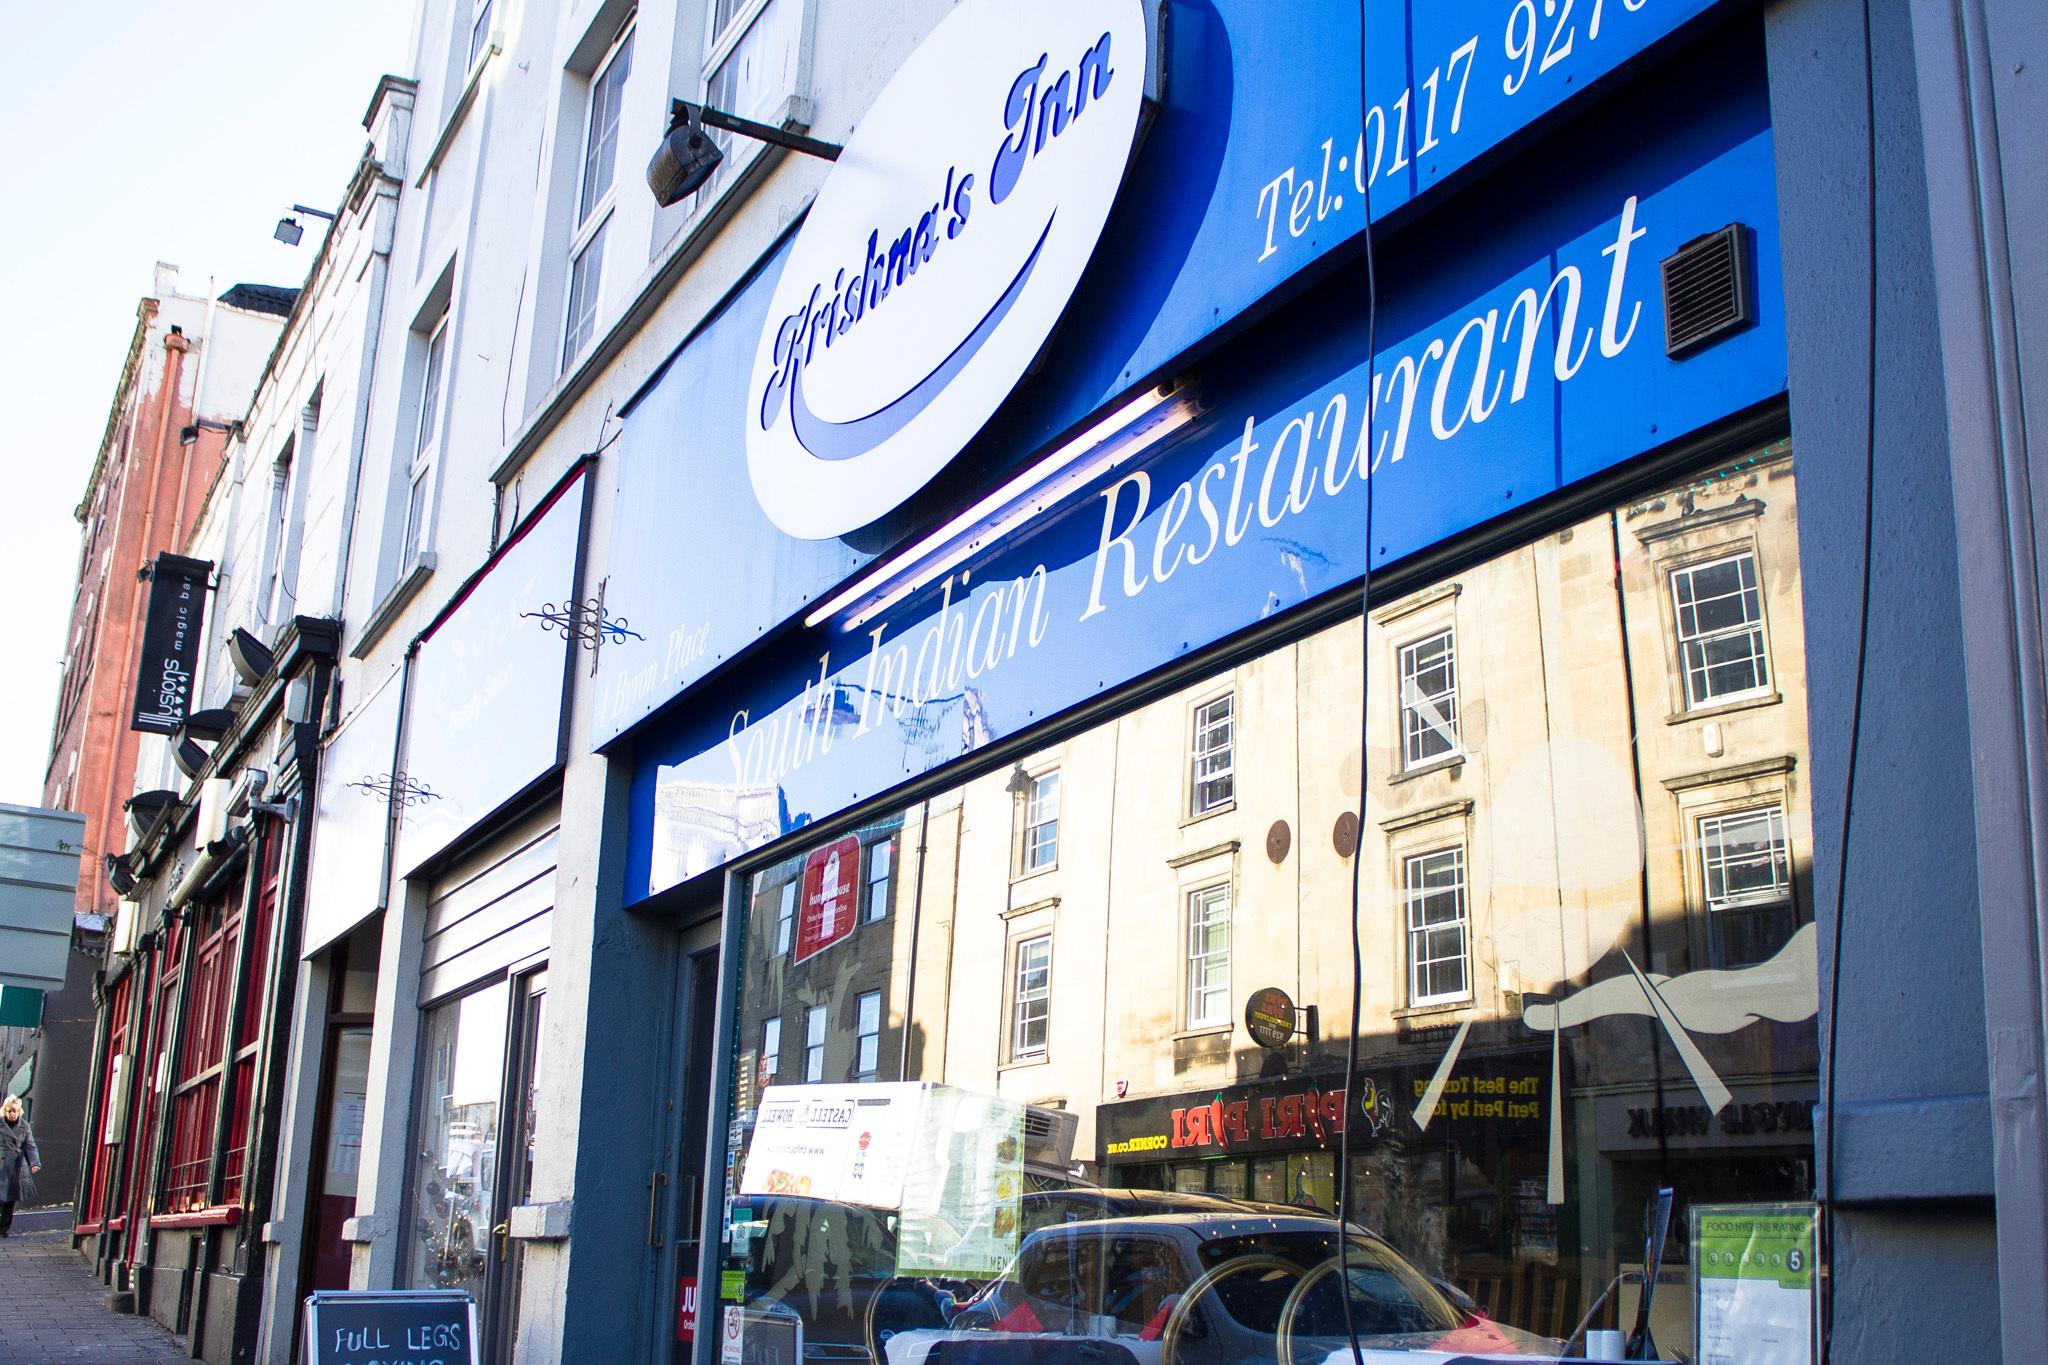 Bristol's Best Vegetarian and Vegan Restaurants - Where to Eat